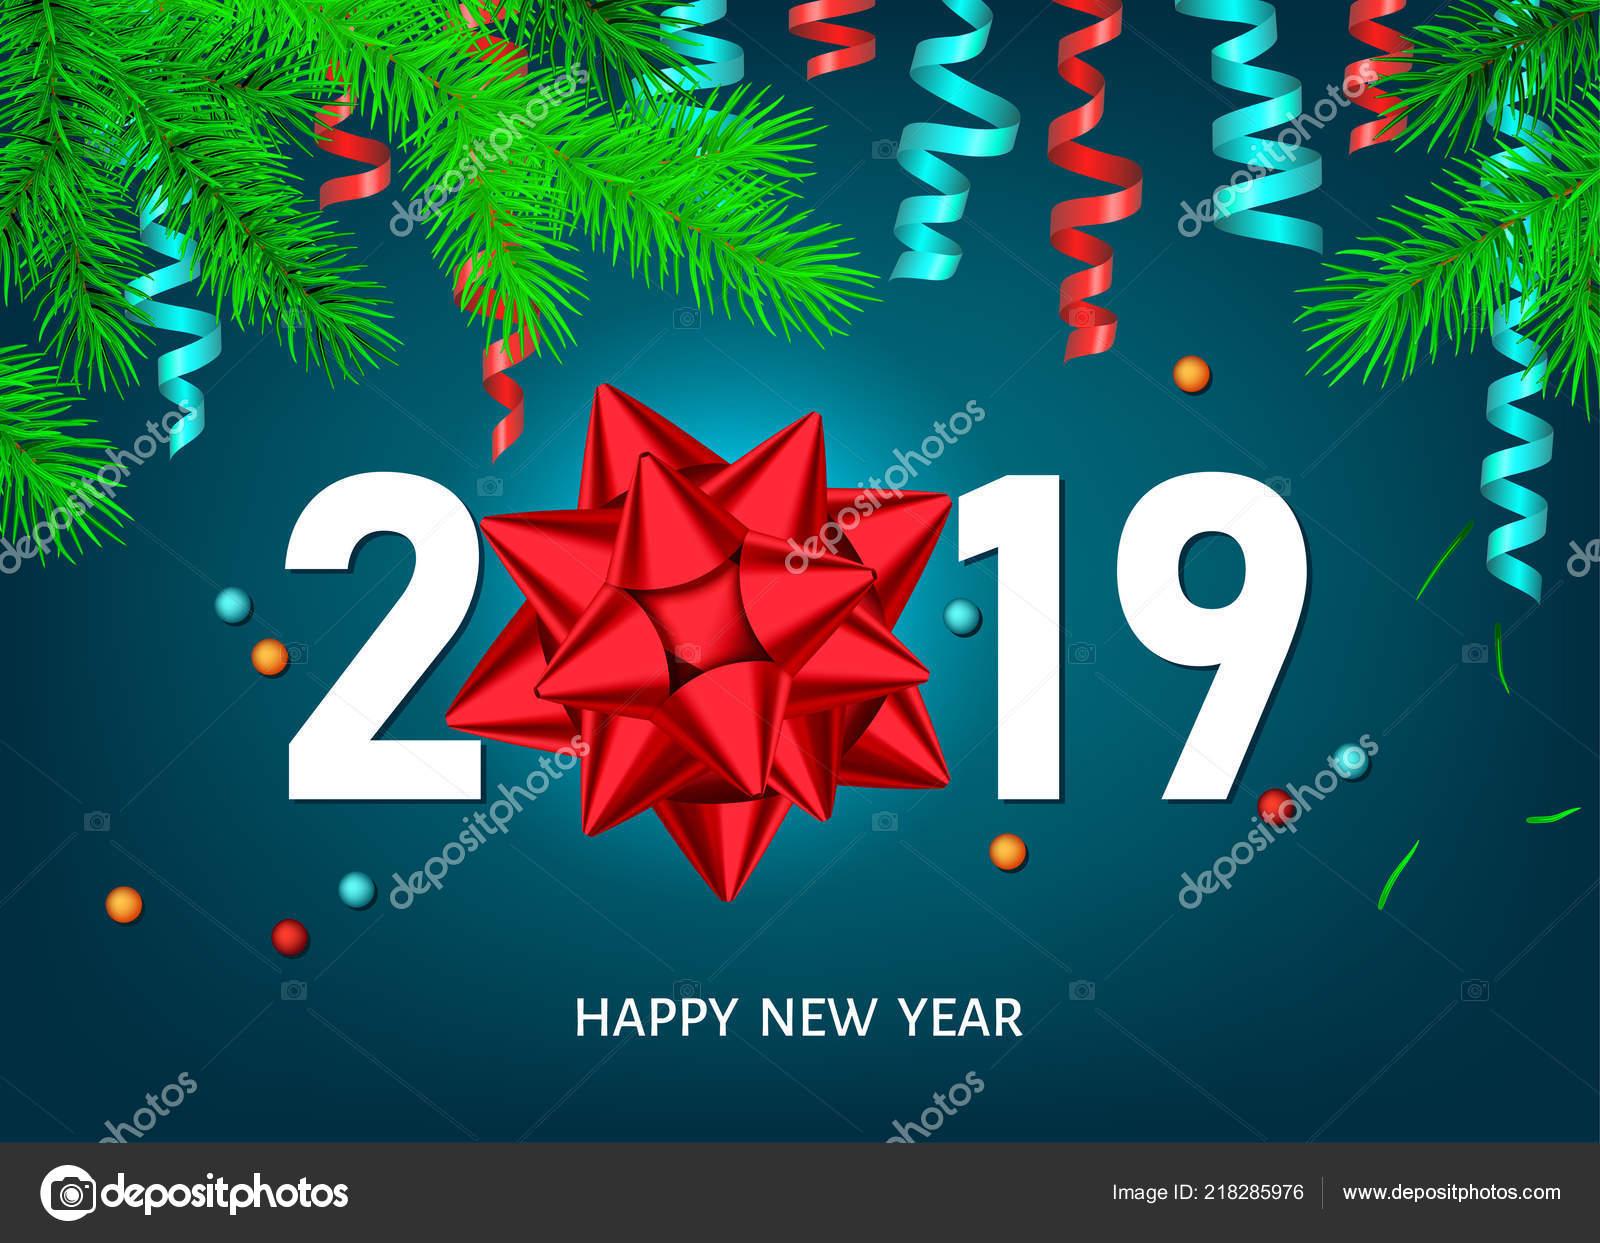 Image De Joyeux Noel 2019.Joyeux Noel Bonne Annee 2019 Fond Avec Branche Bow Ruban